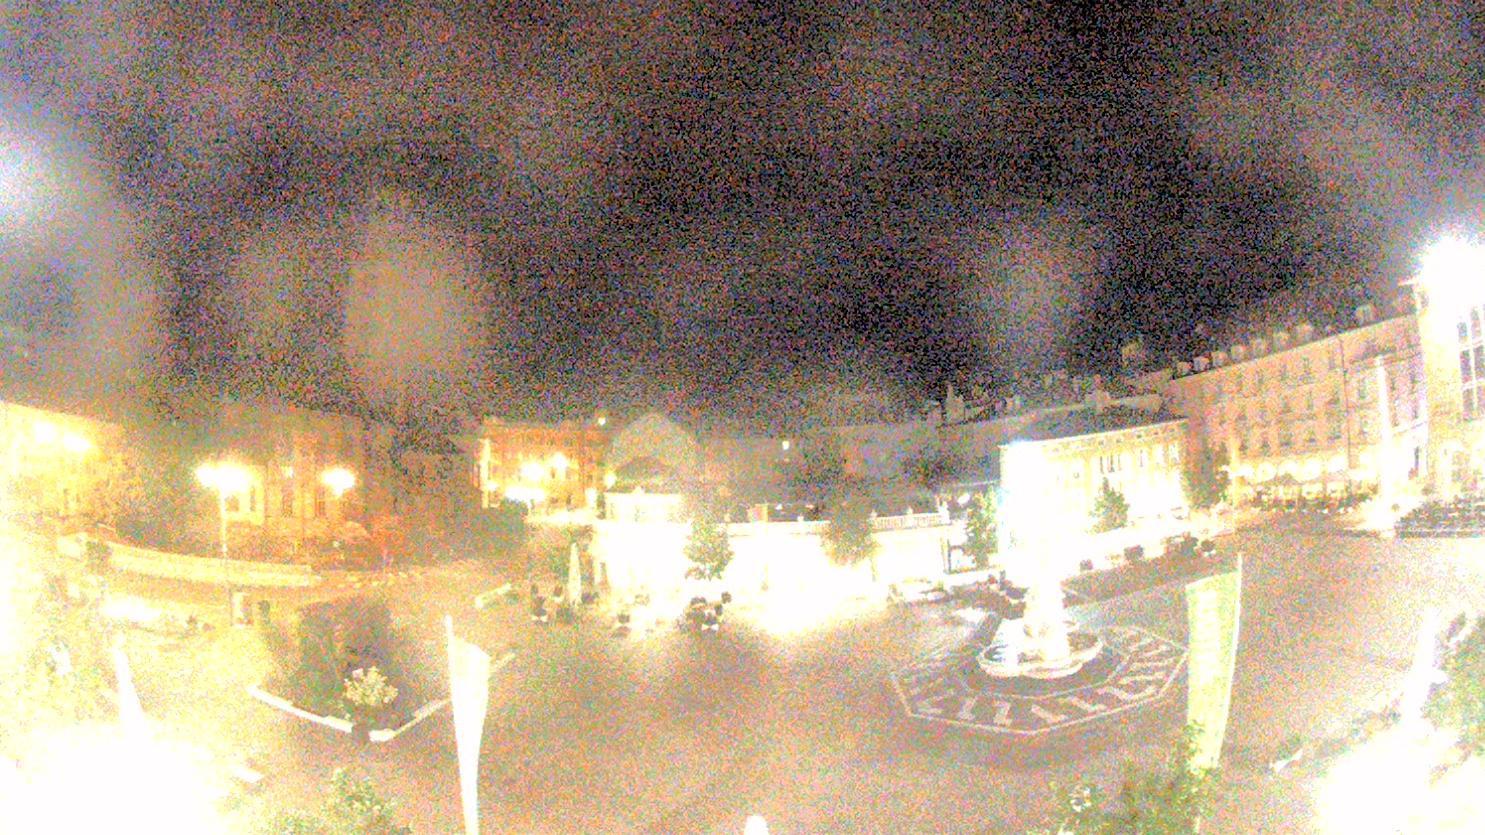 Webcam Bolzano: Trentino − Alto Adige − Piazza Walter hd-